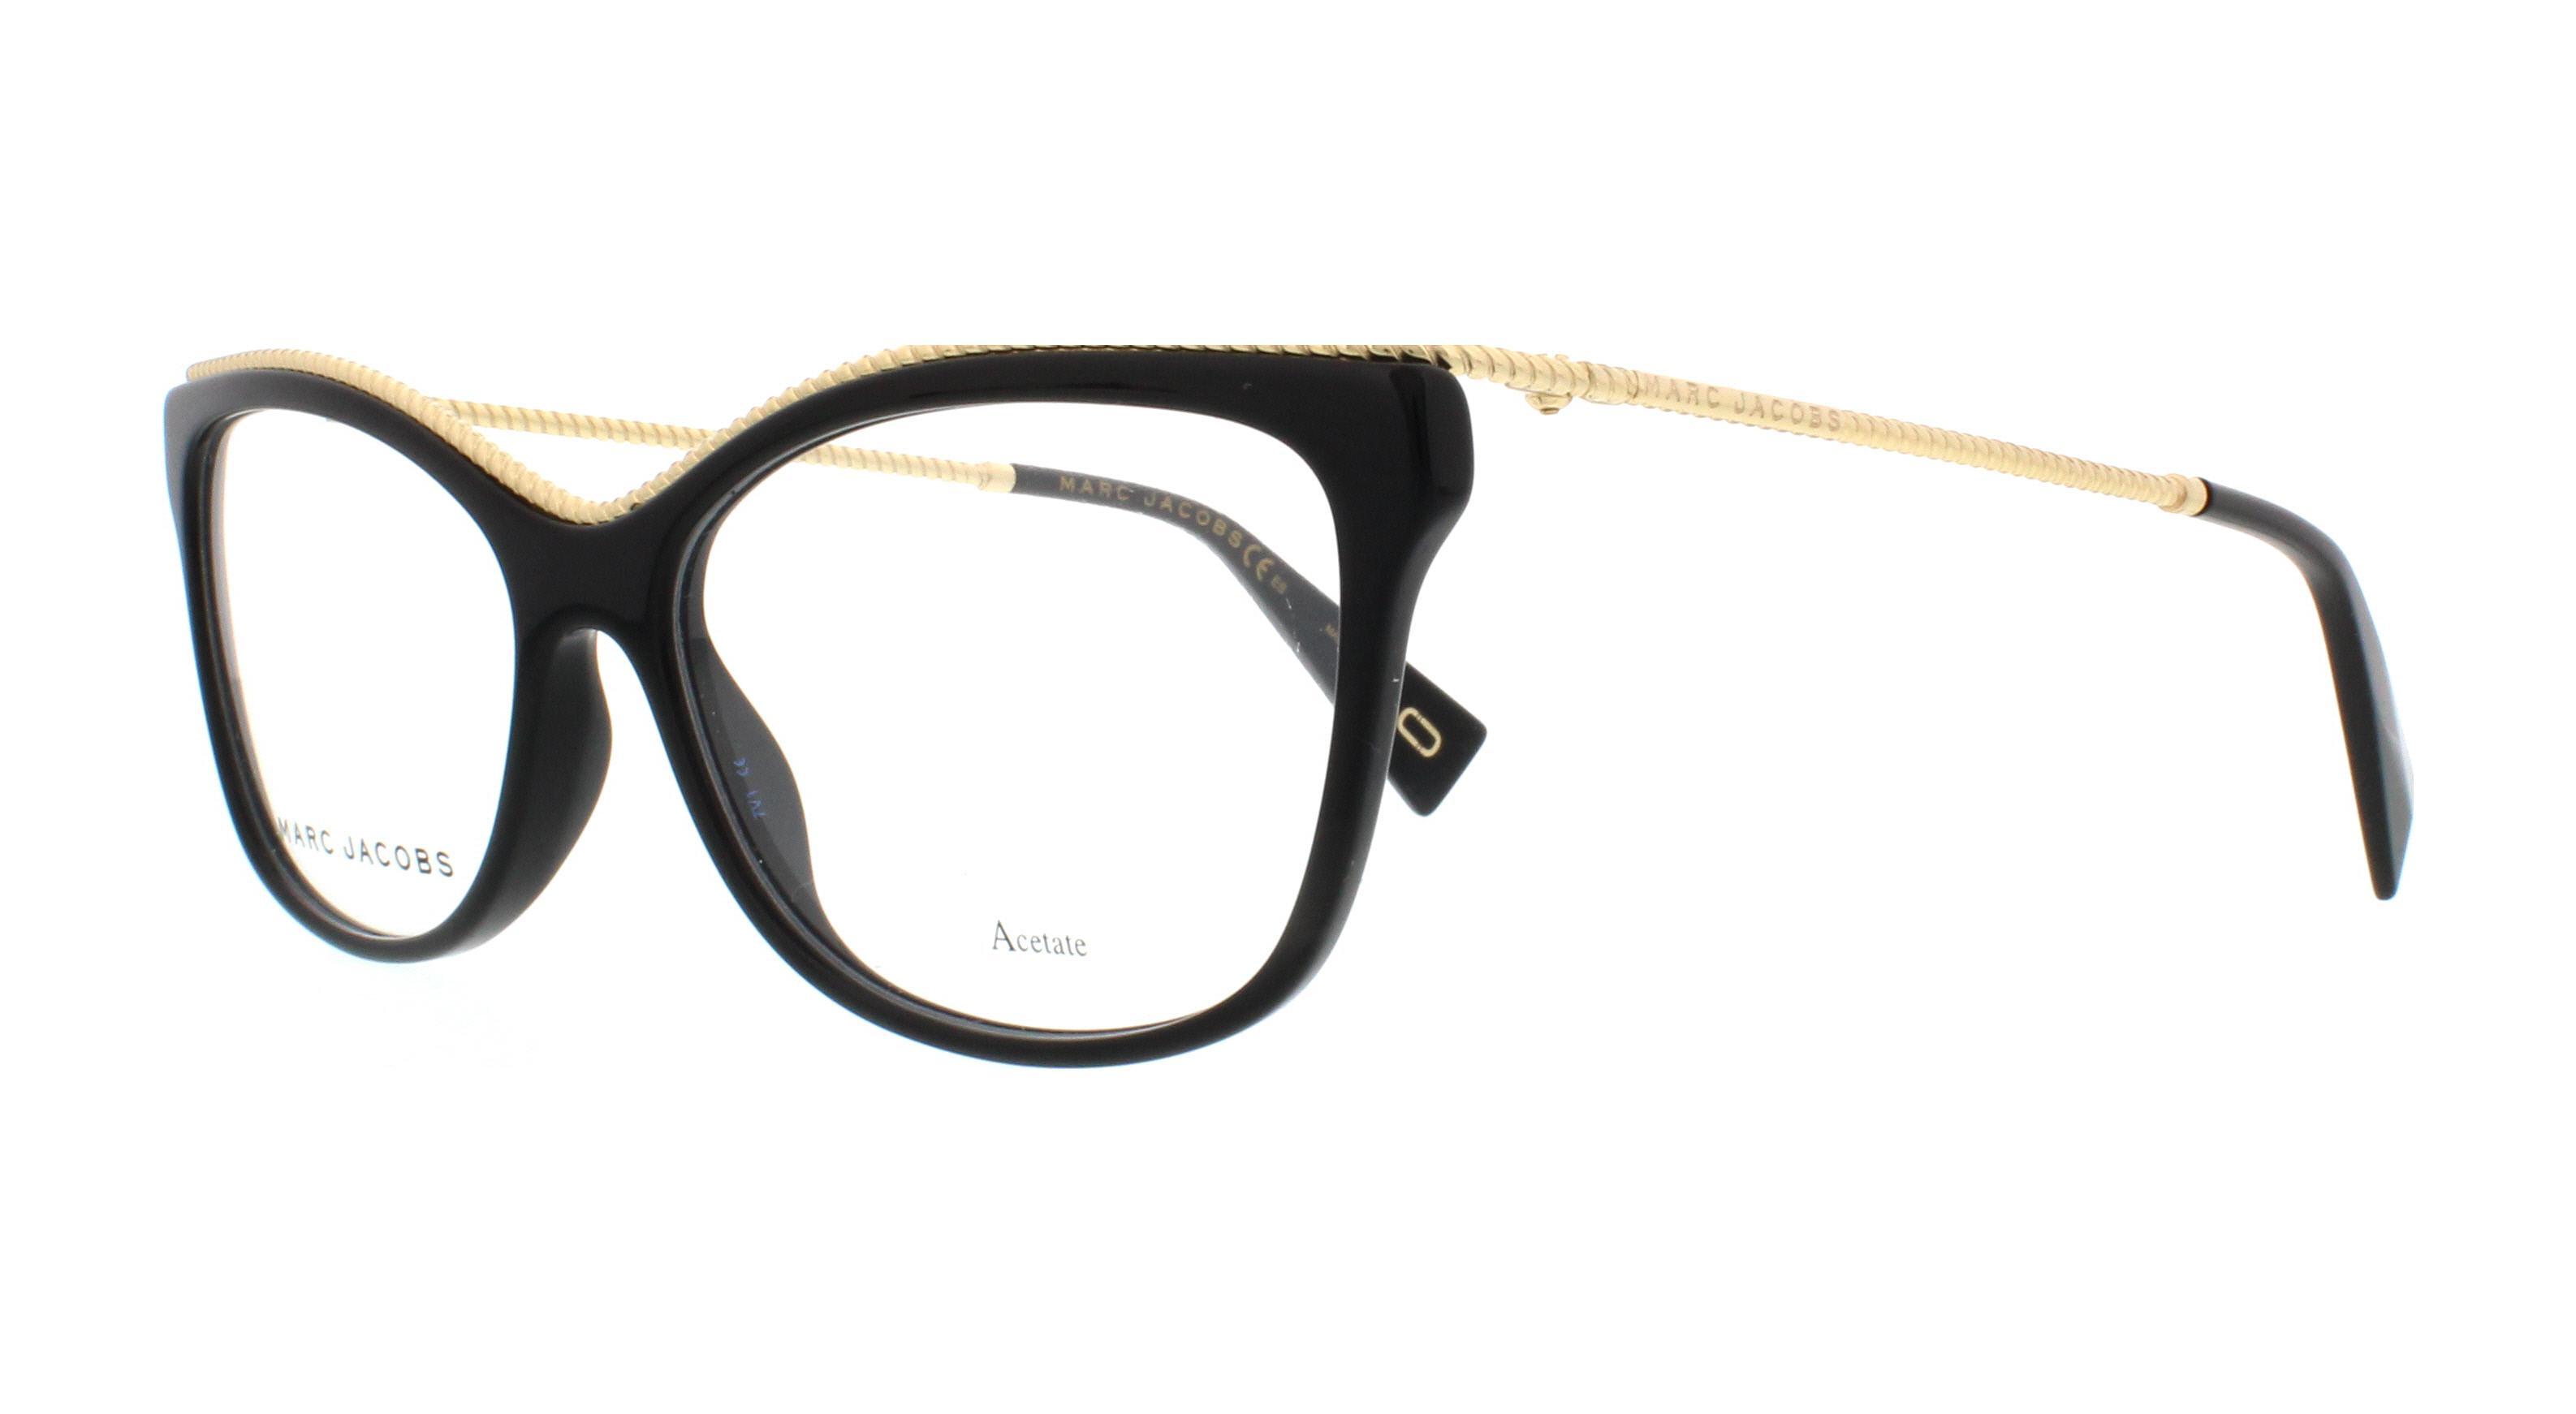 ffd0f92e53e MARC JACOBS Eyeglasses MARC 167 0807 Black 55MM 762753691897